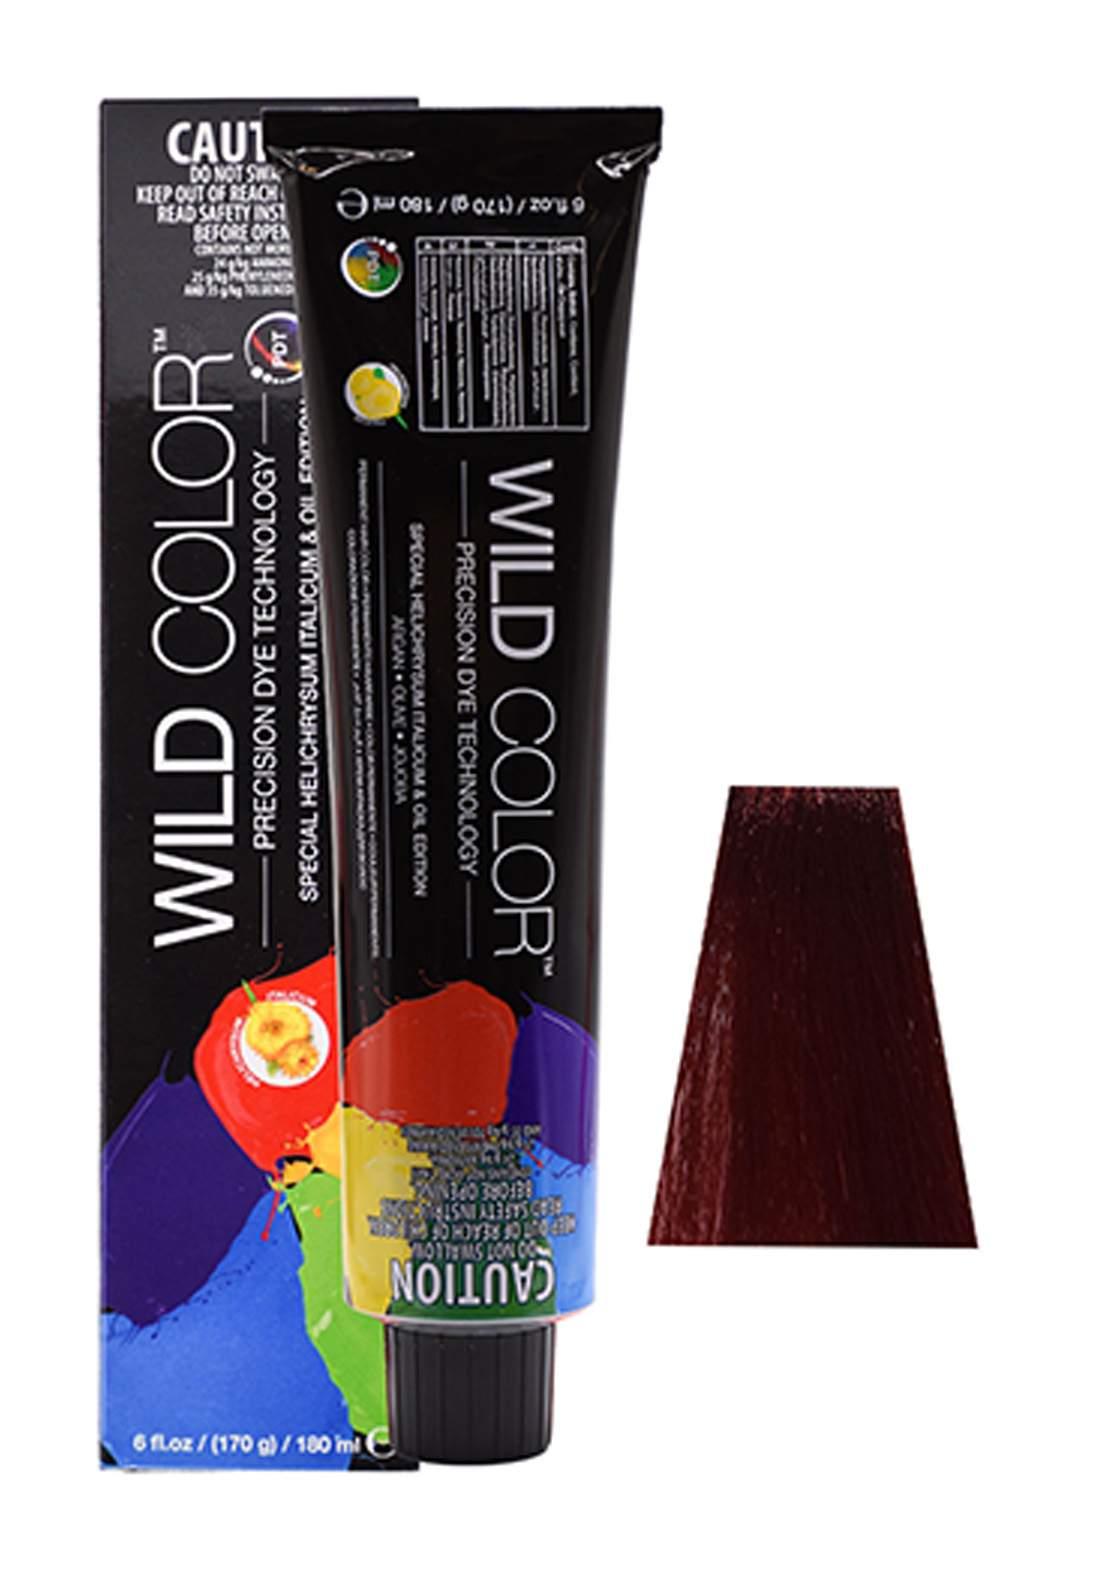 Wild Color Hair Color Cream 6.6  6R -Dark  Red Blond صبغة شعر